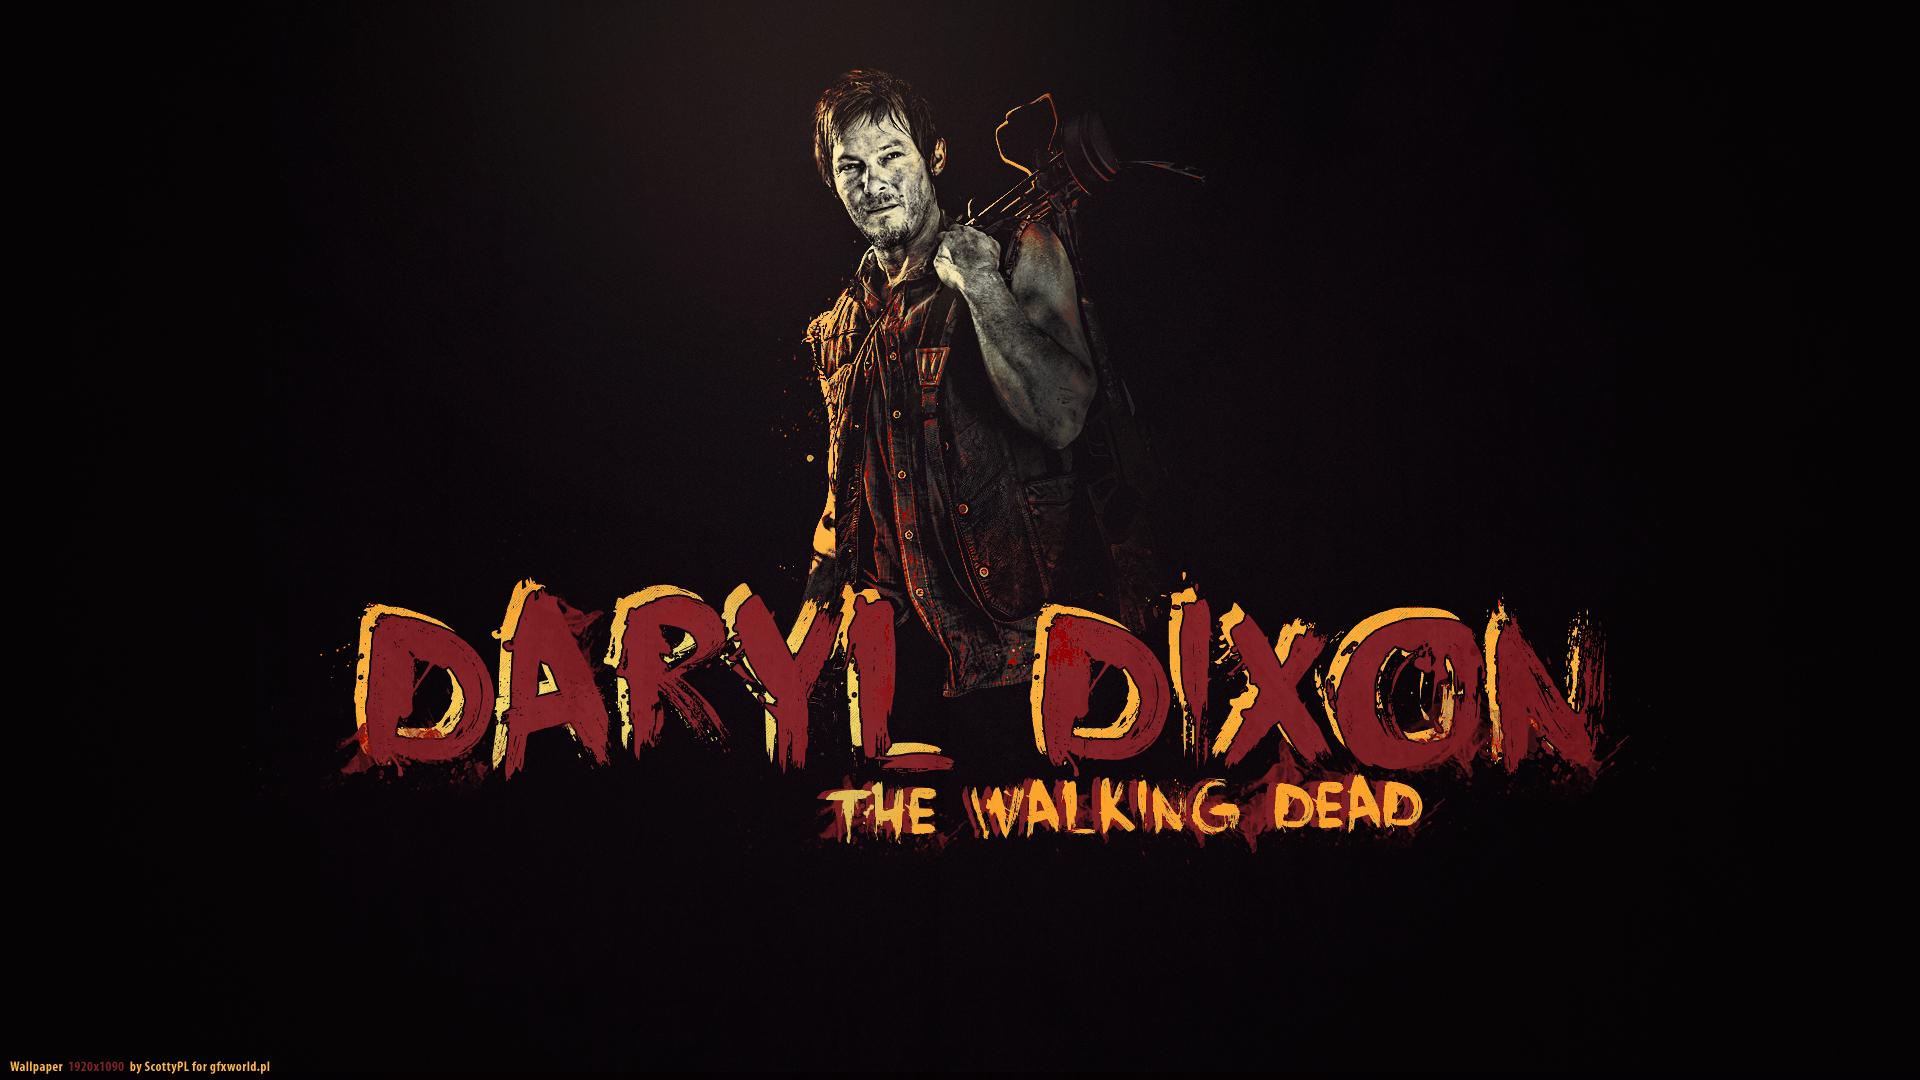 Tv show the walking dead daryl dixon the walking dead norman